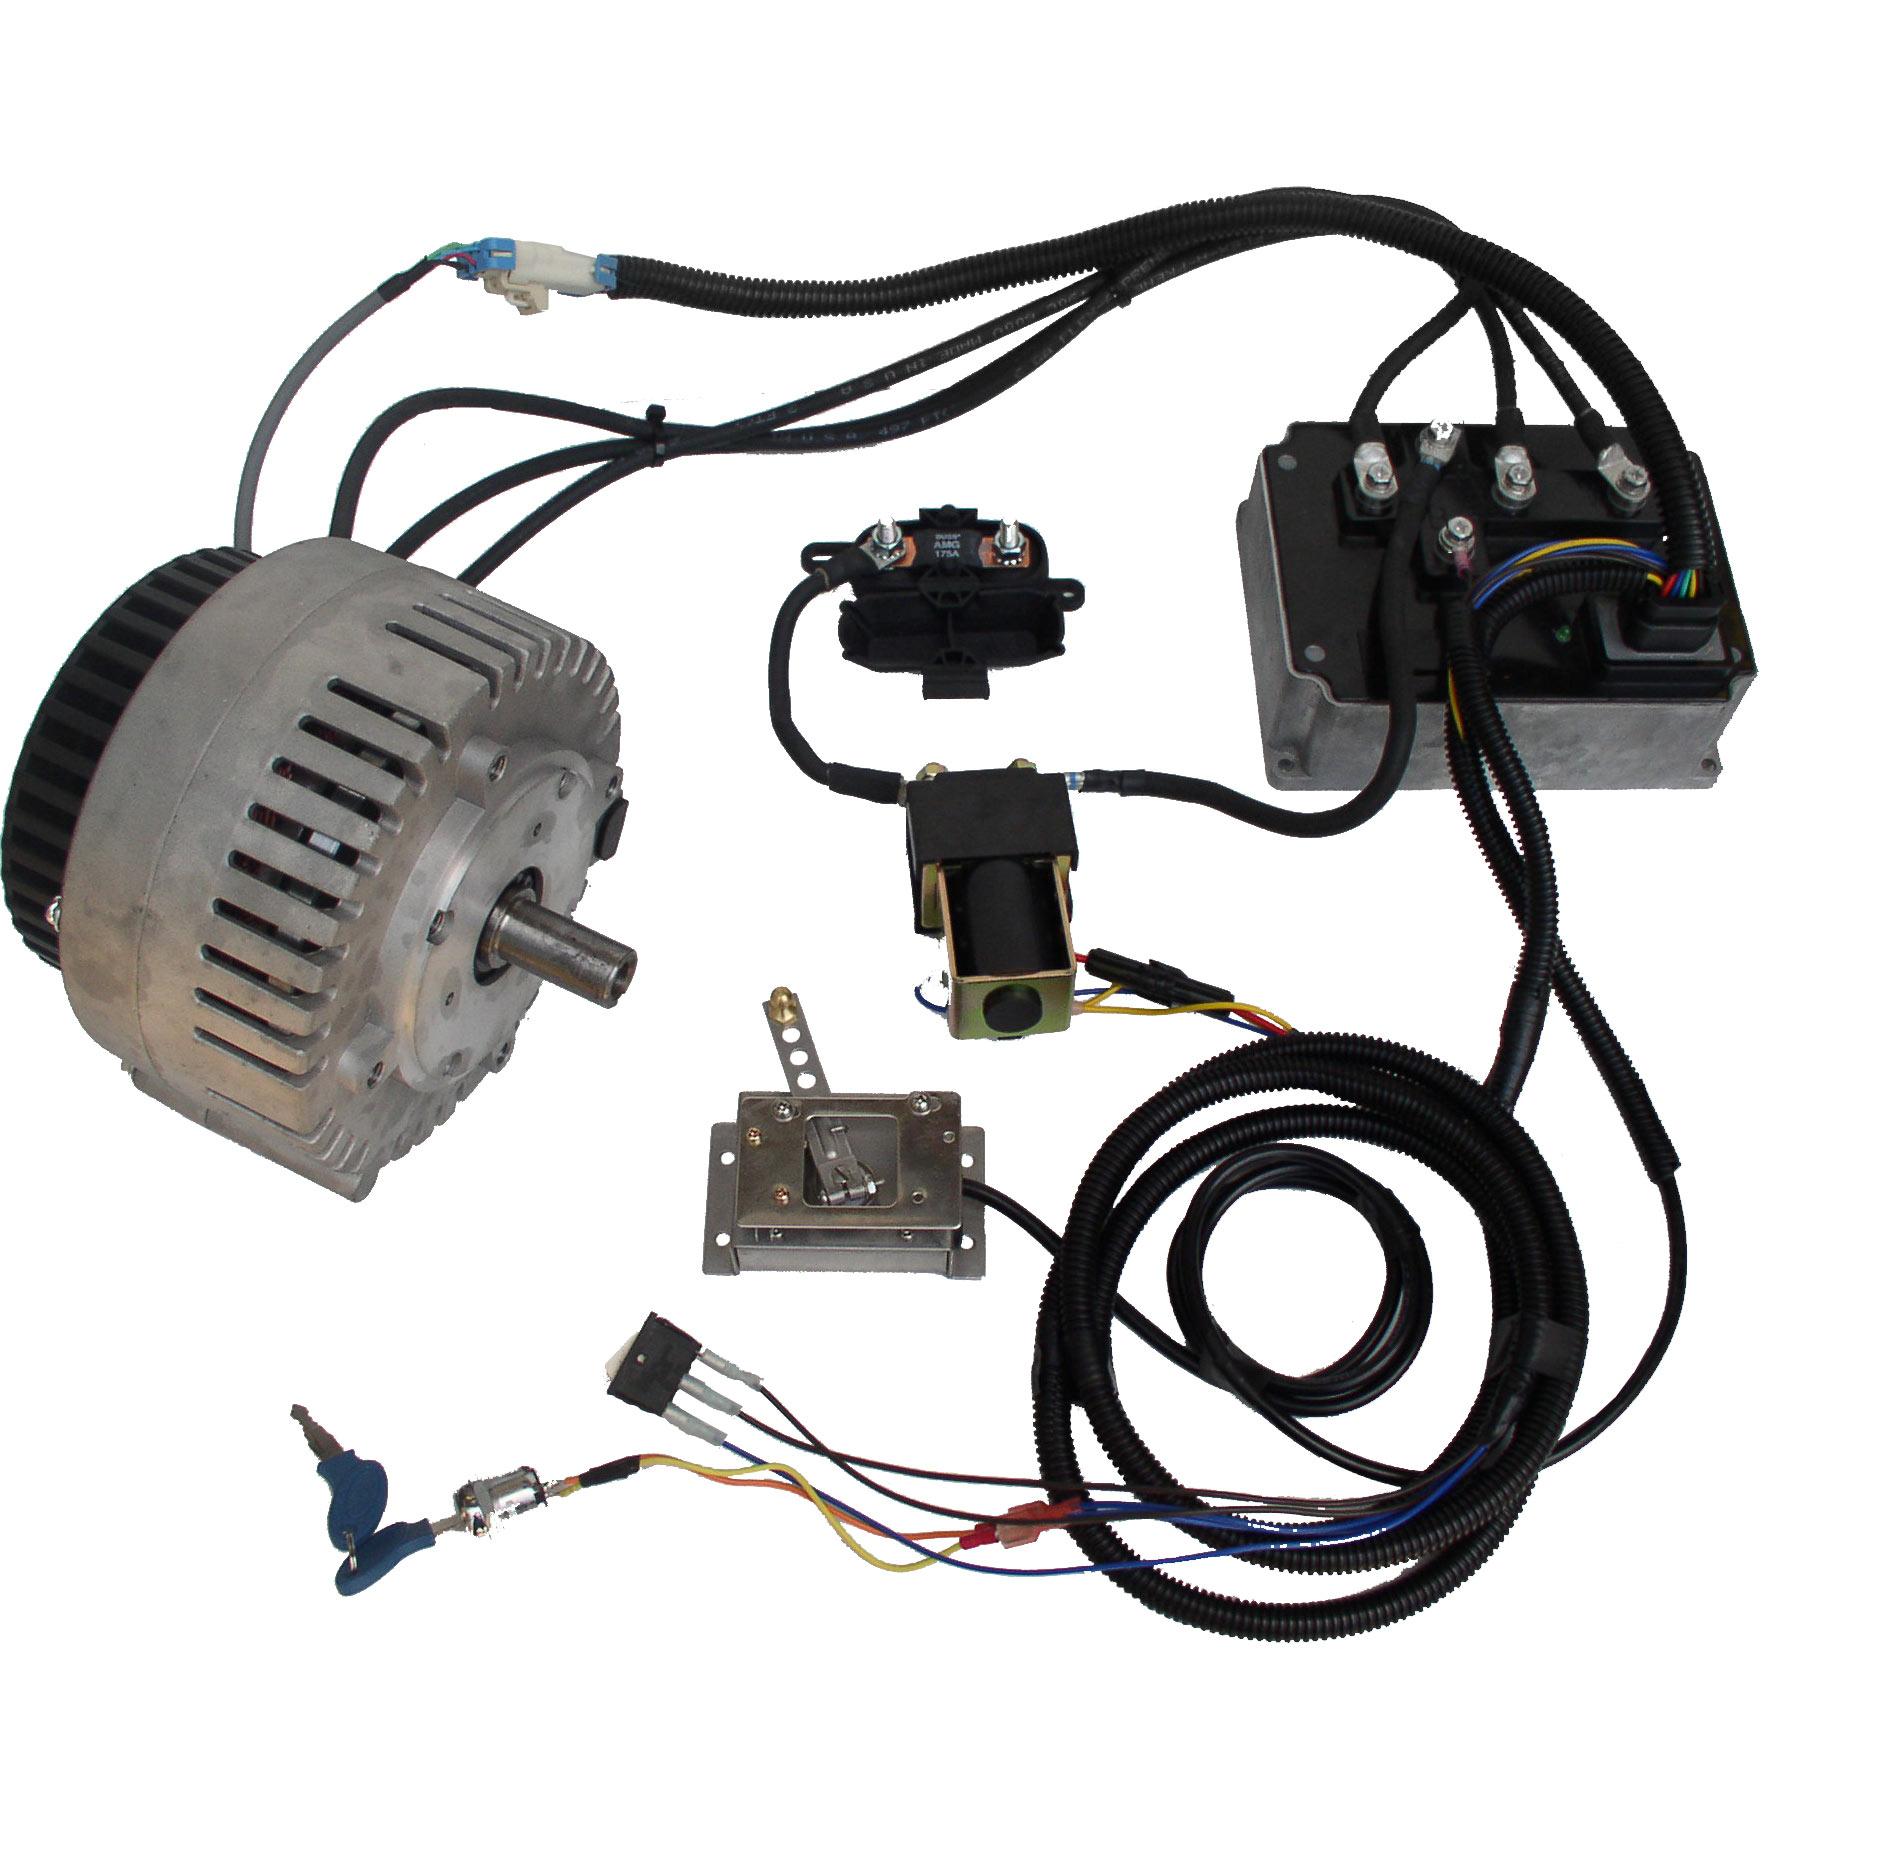 Mars brushless pmac motor with 72v 350a controller kit pmac g8435